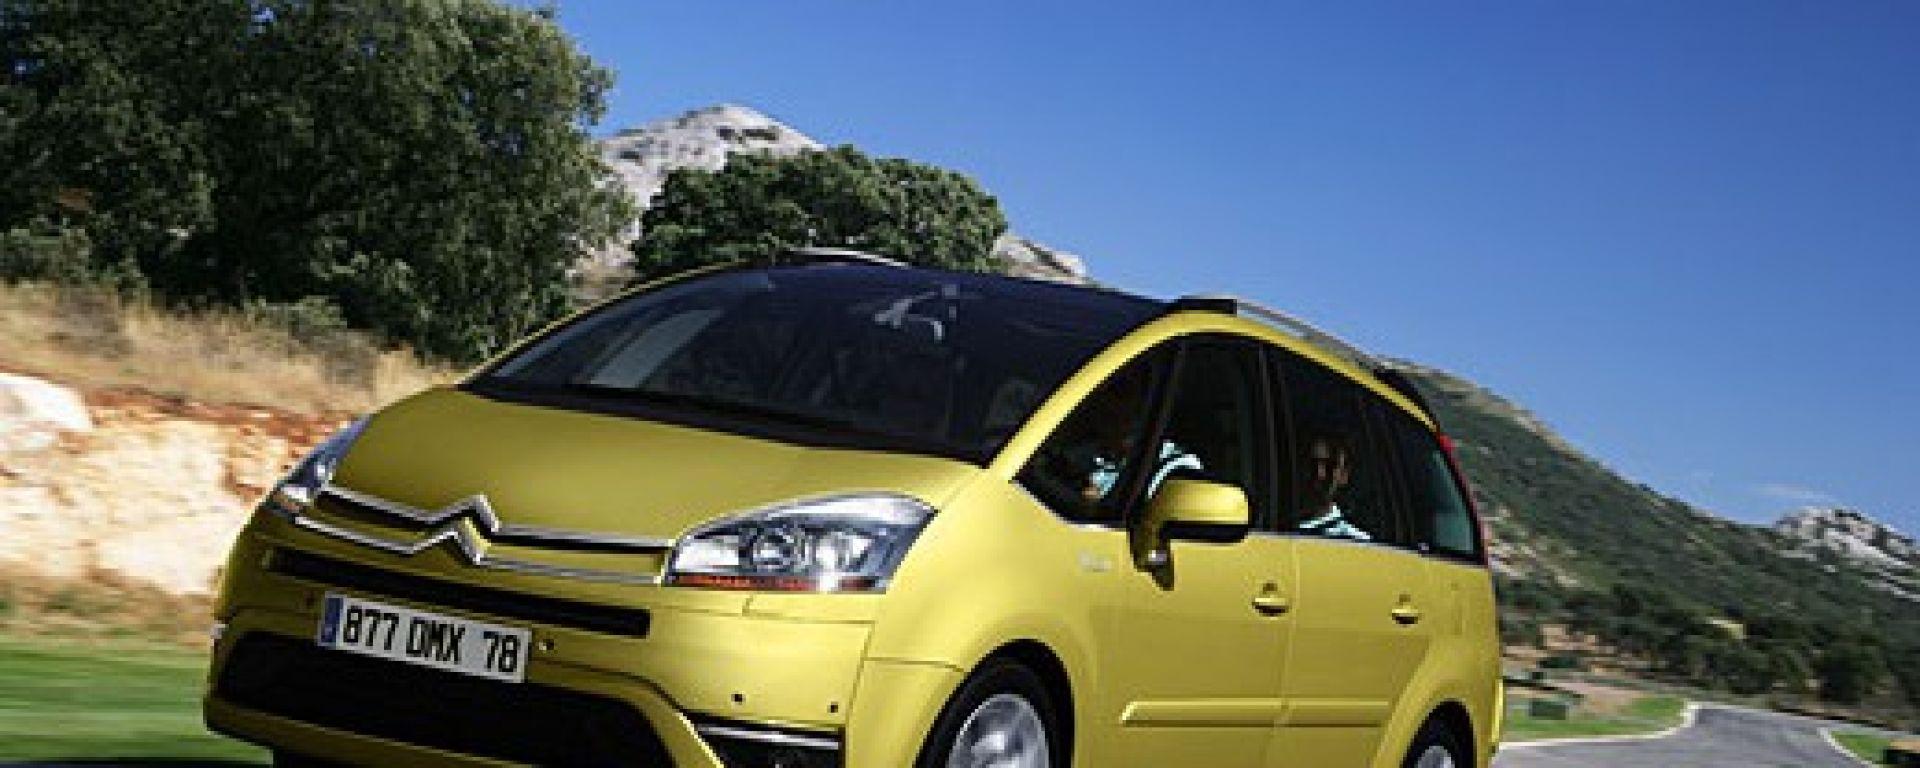 Citroën Picasso 2007